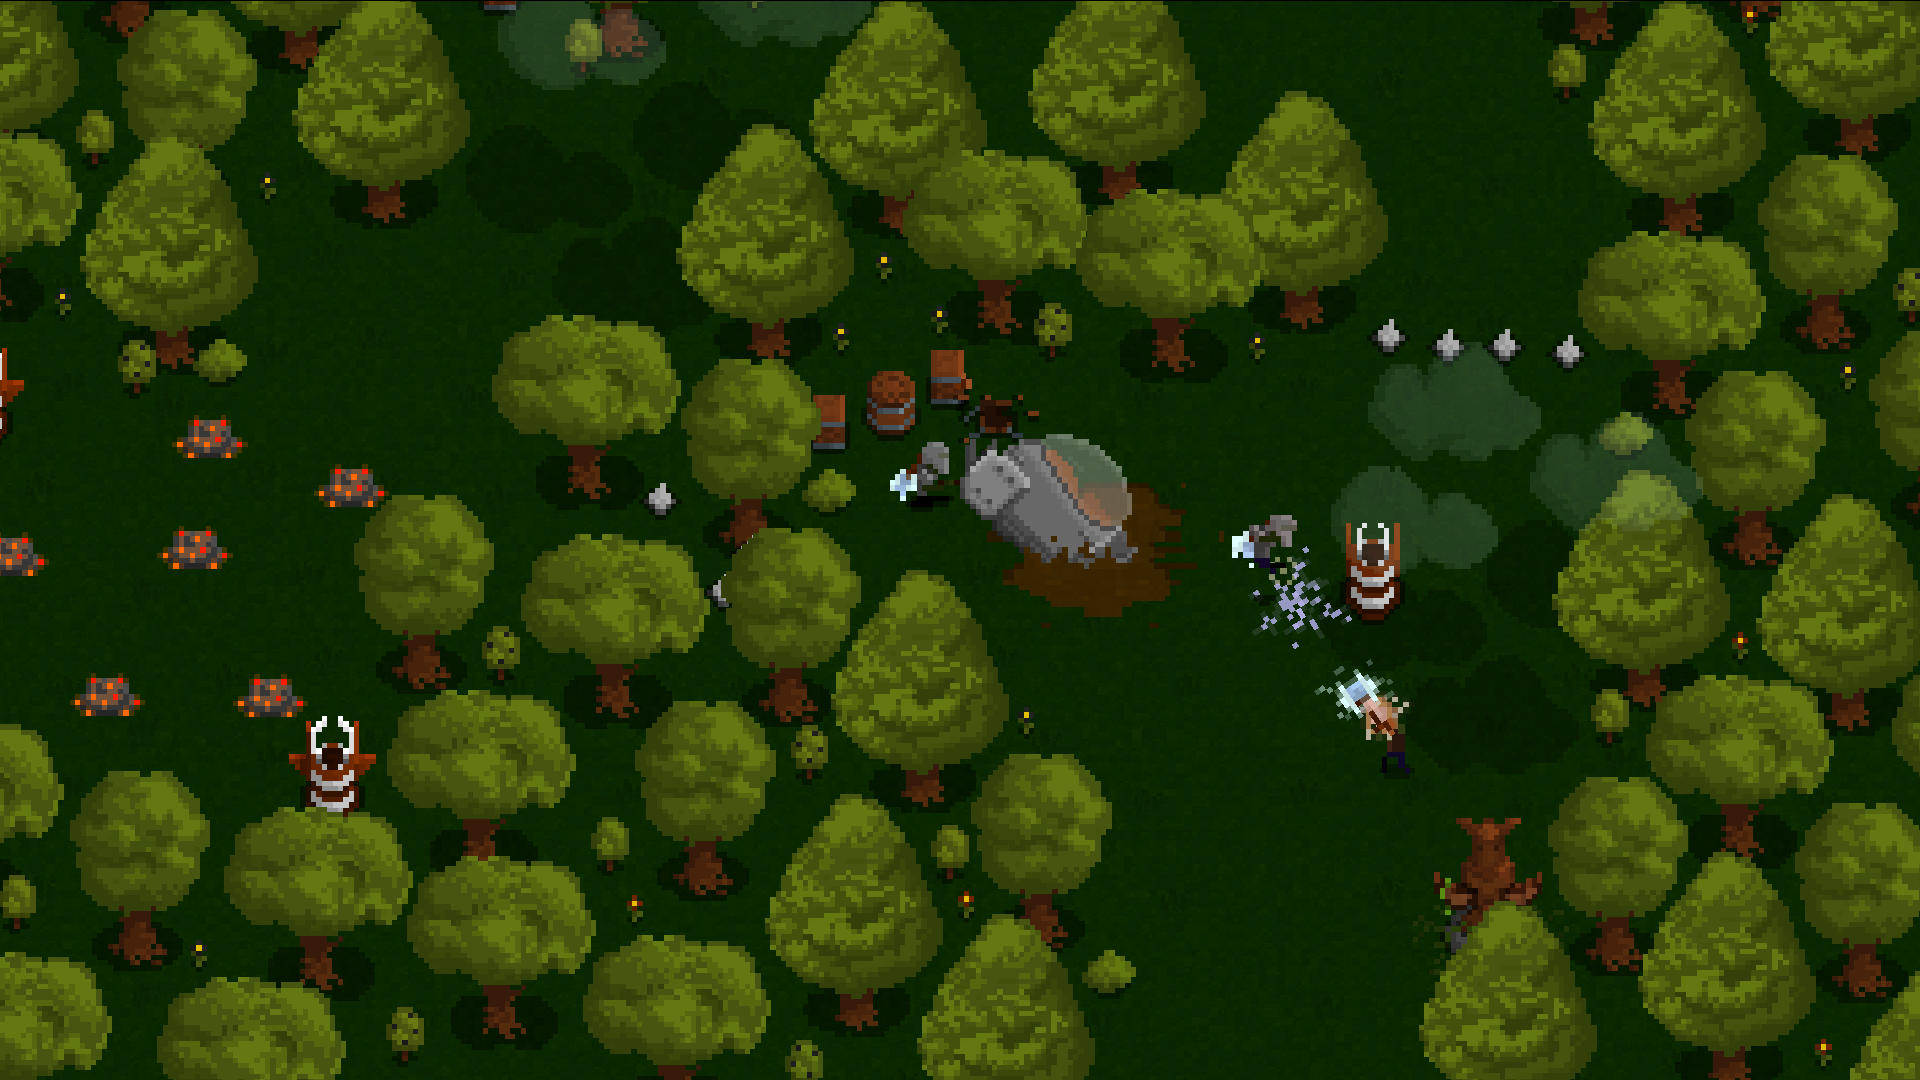 Totem - Action, Rpg in Steam Greenlight - Изображение 1